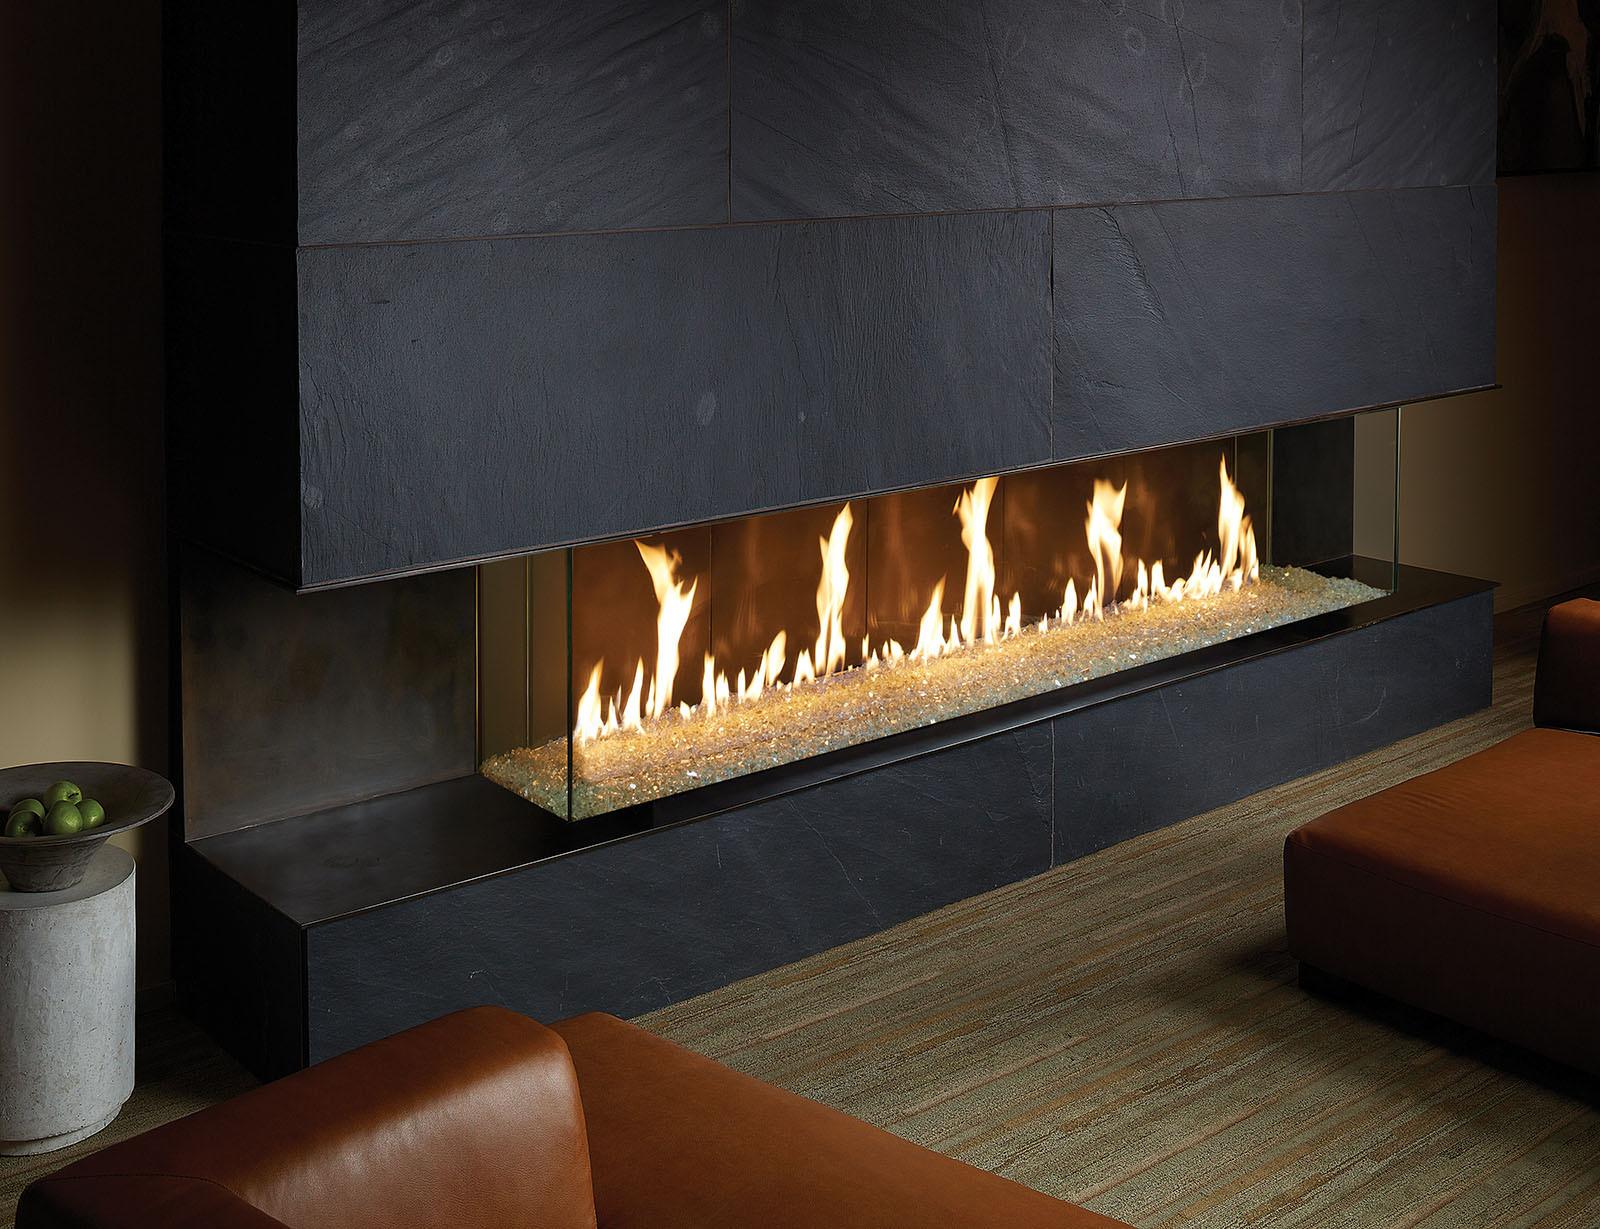 Davinci Gas Fireplace Bay 72x12 109137